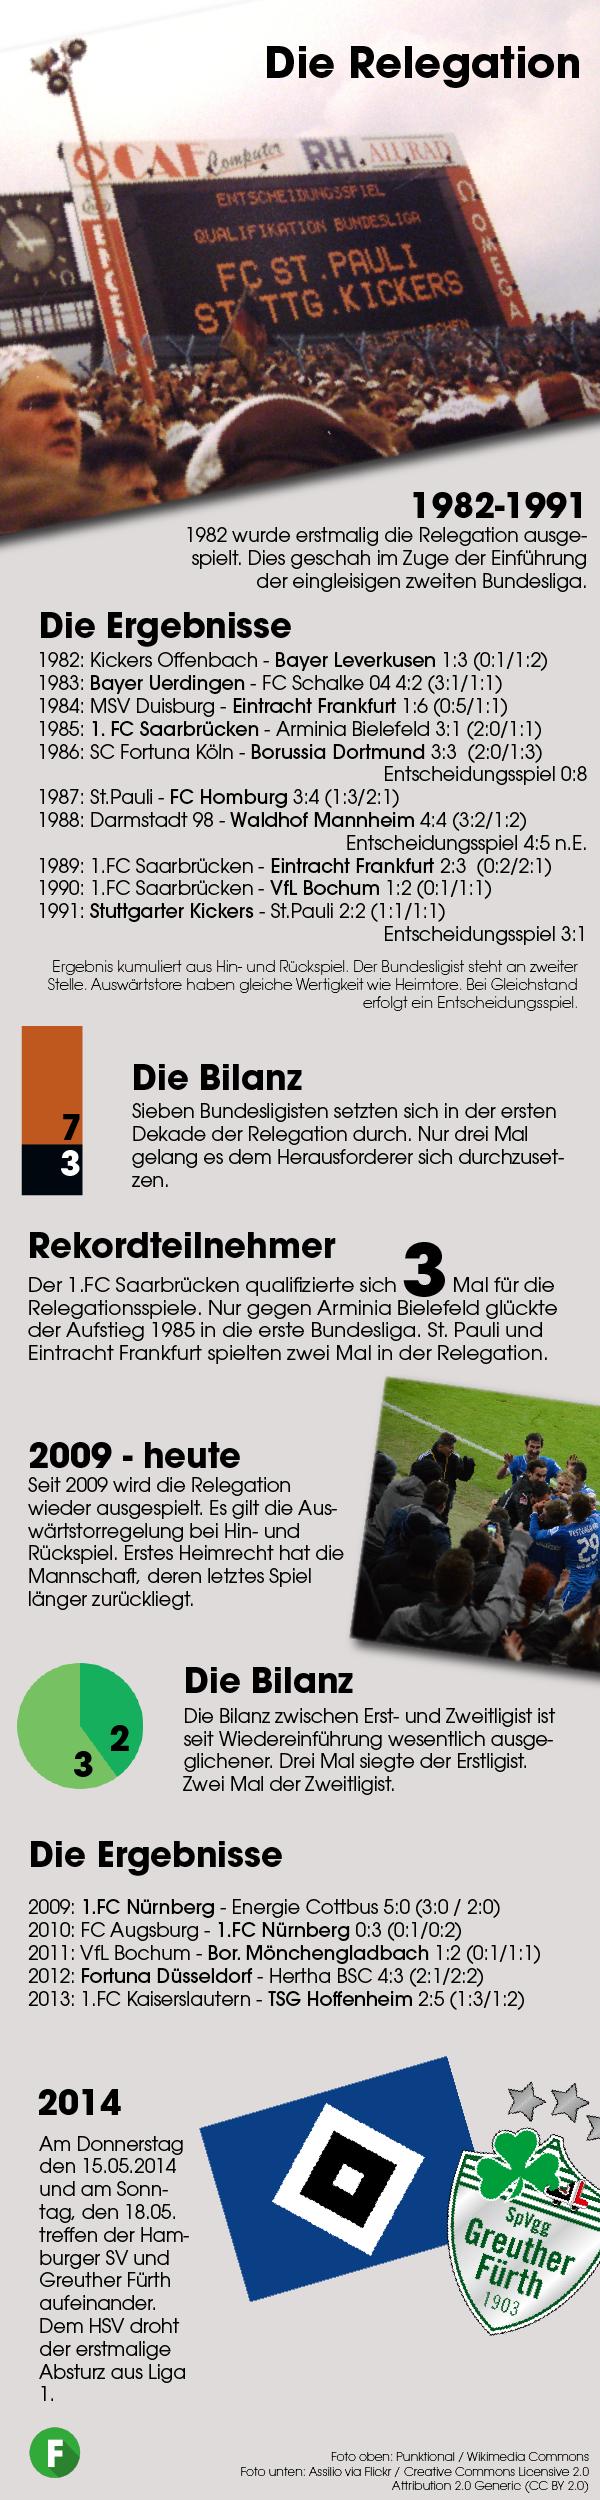 datenschrank-01